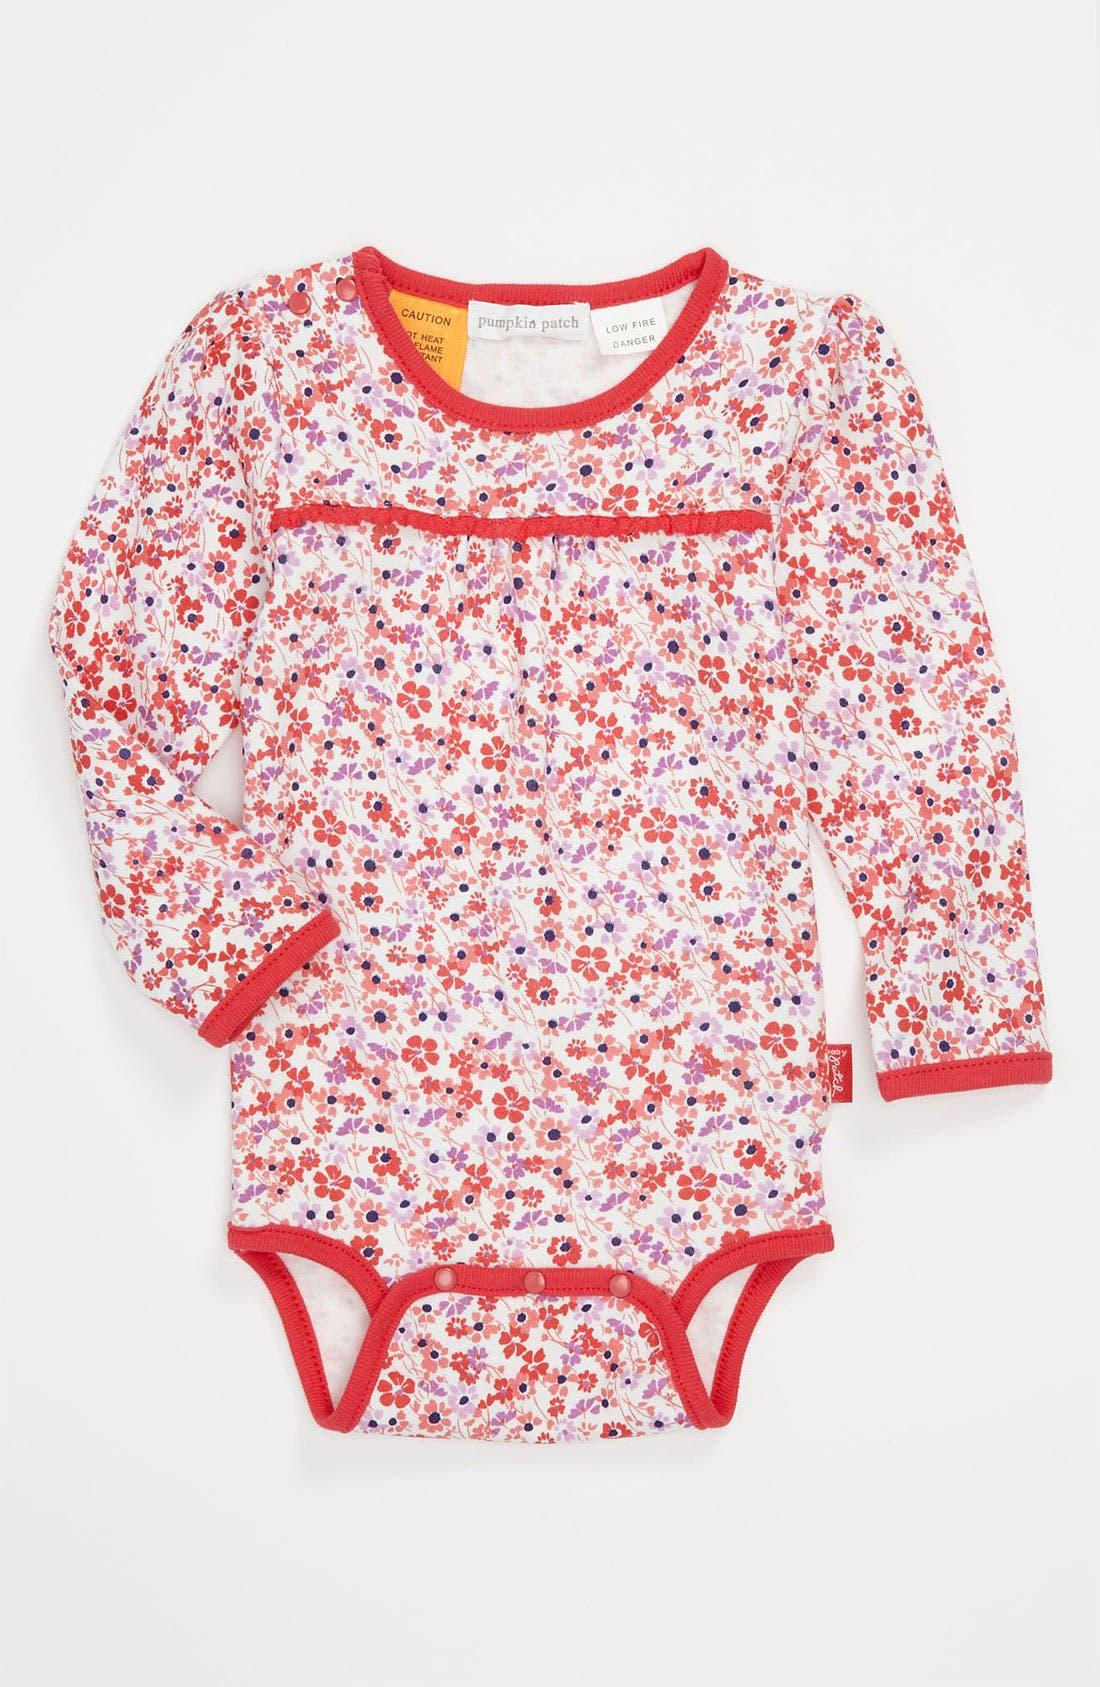 Alternate Image 1 Selected - Pumpkin Patch Long Sleeve Bodysuit (Infant)